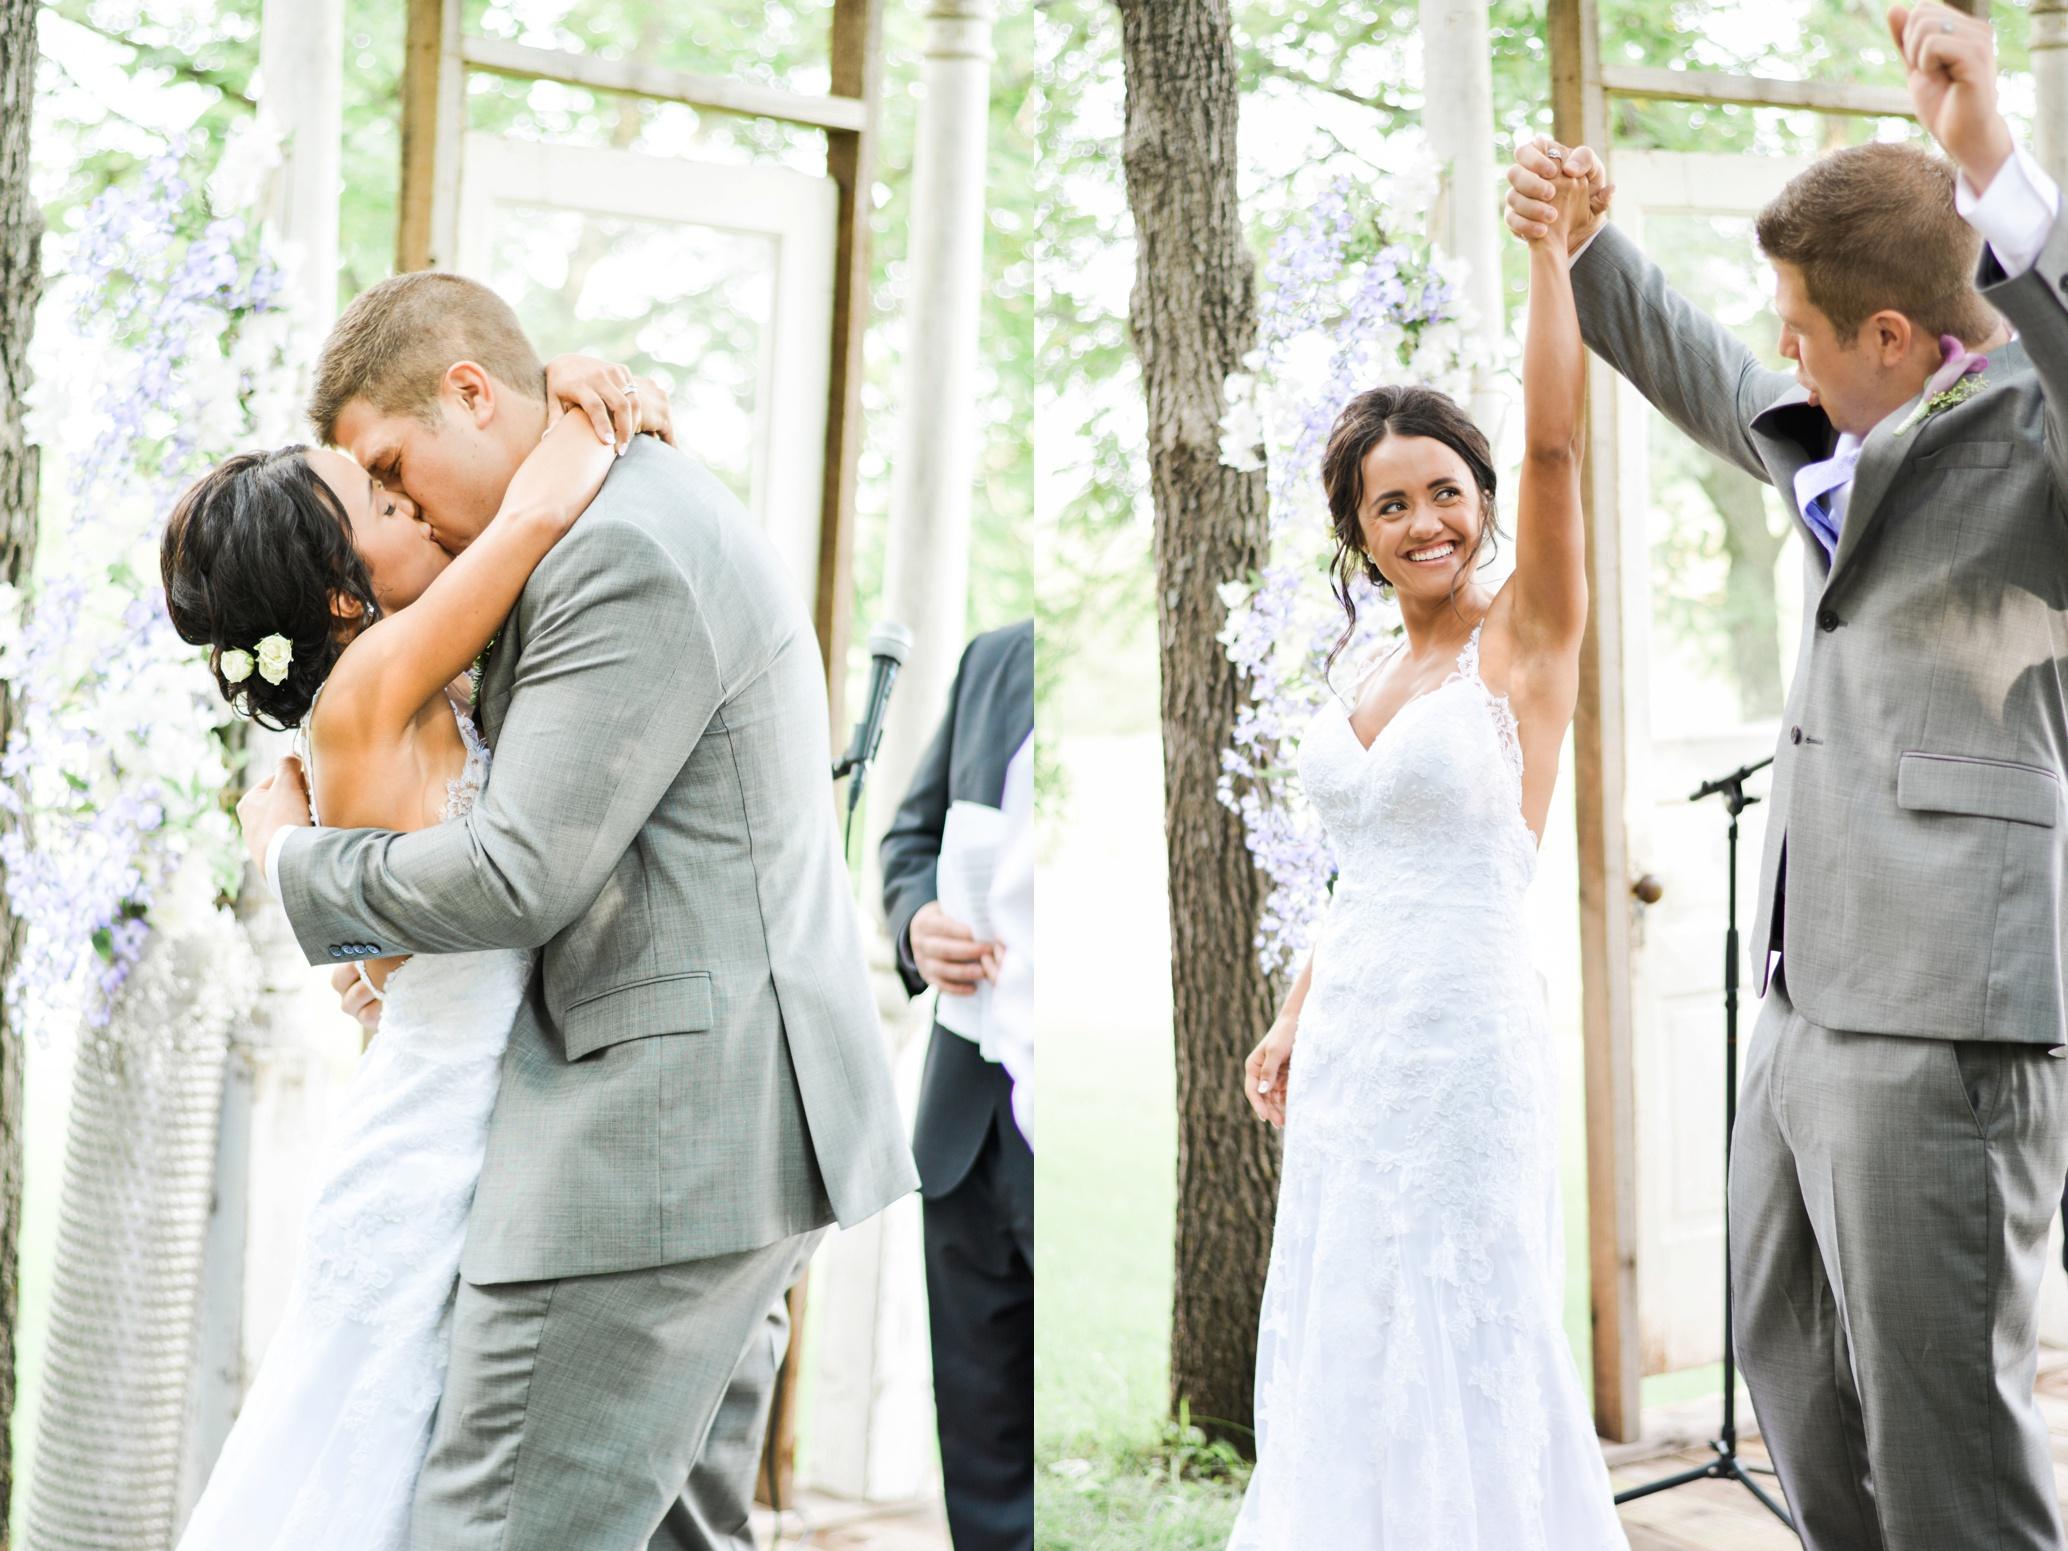 Barnes' Place Rustic Outdoor Wedding | Ali Leigh Photo Minneapolis Wedding Photographer_0119.jpg